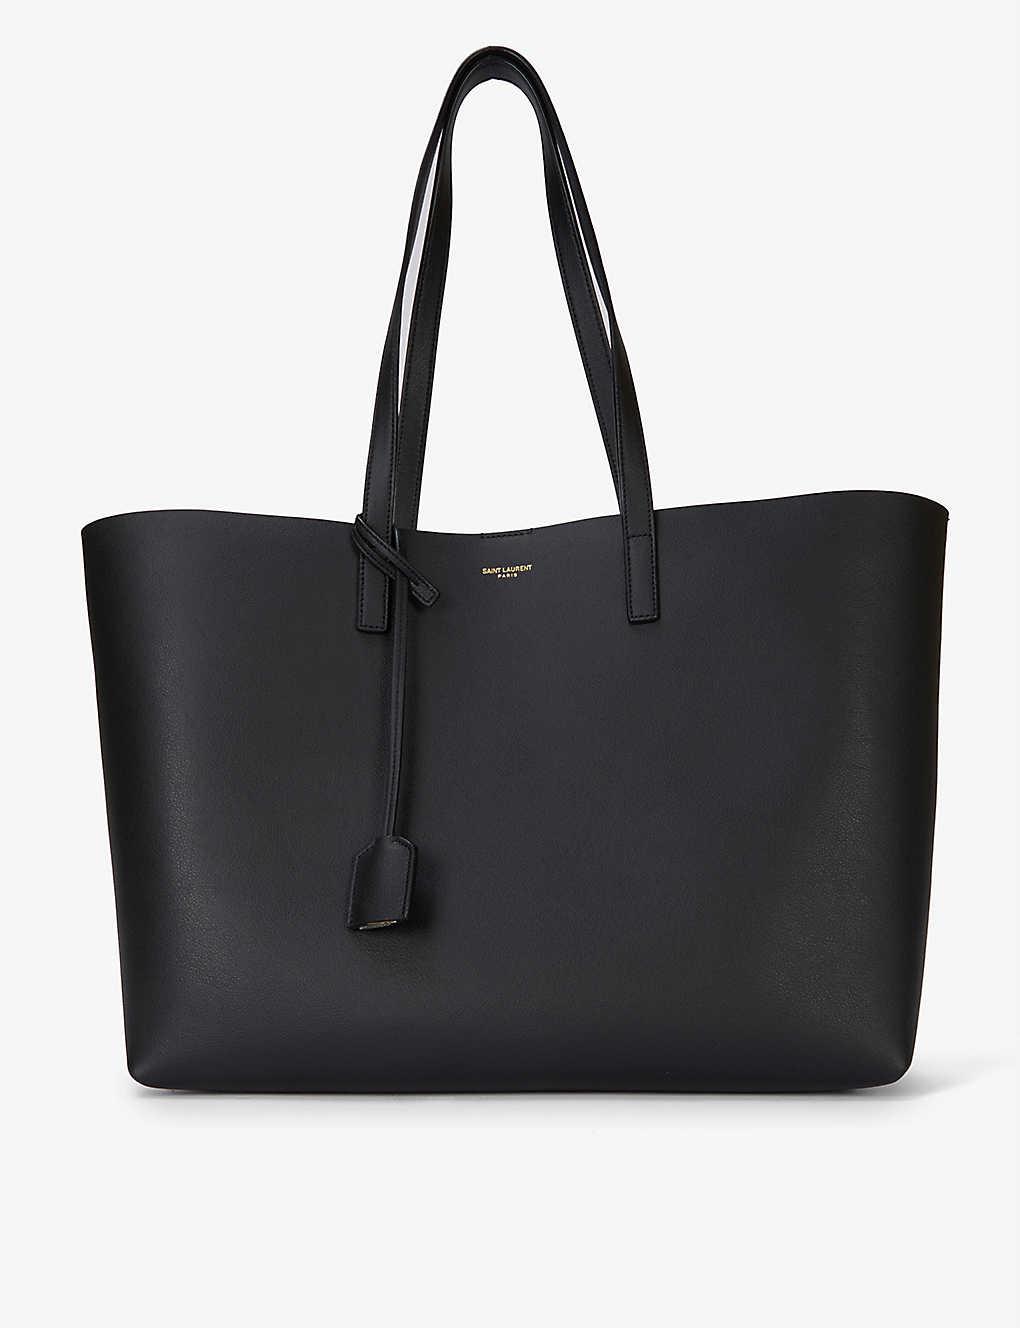 Oversized bags - Womens - Bags - Selfridges | Shop Online